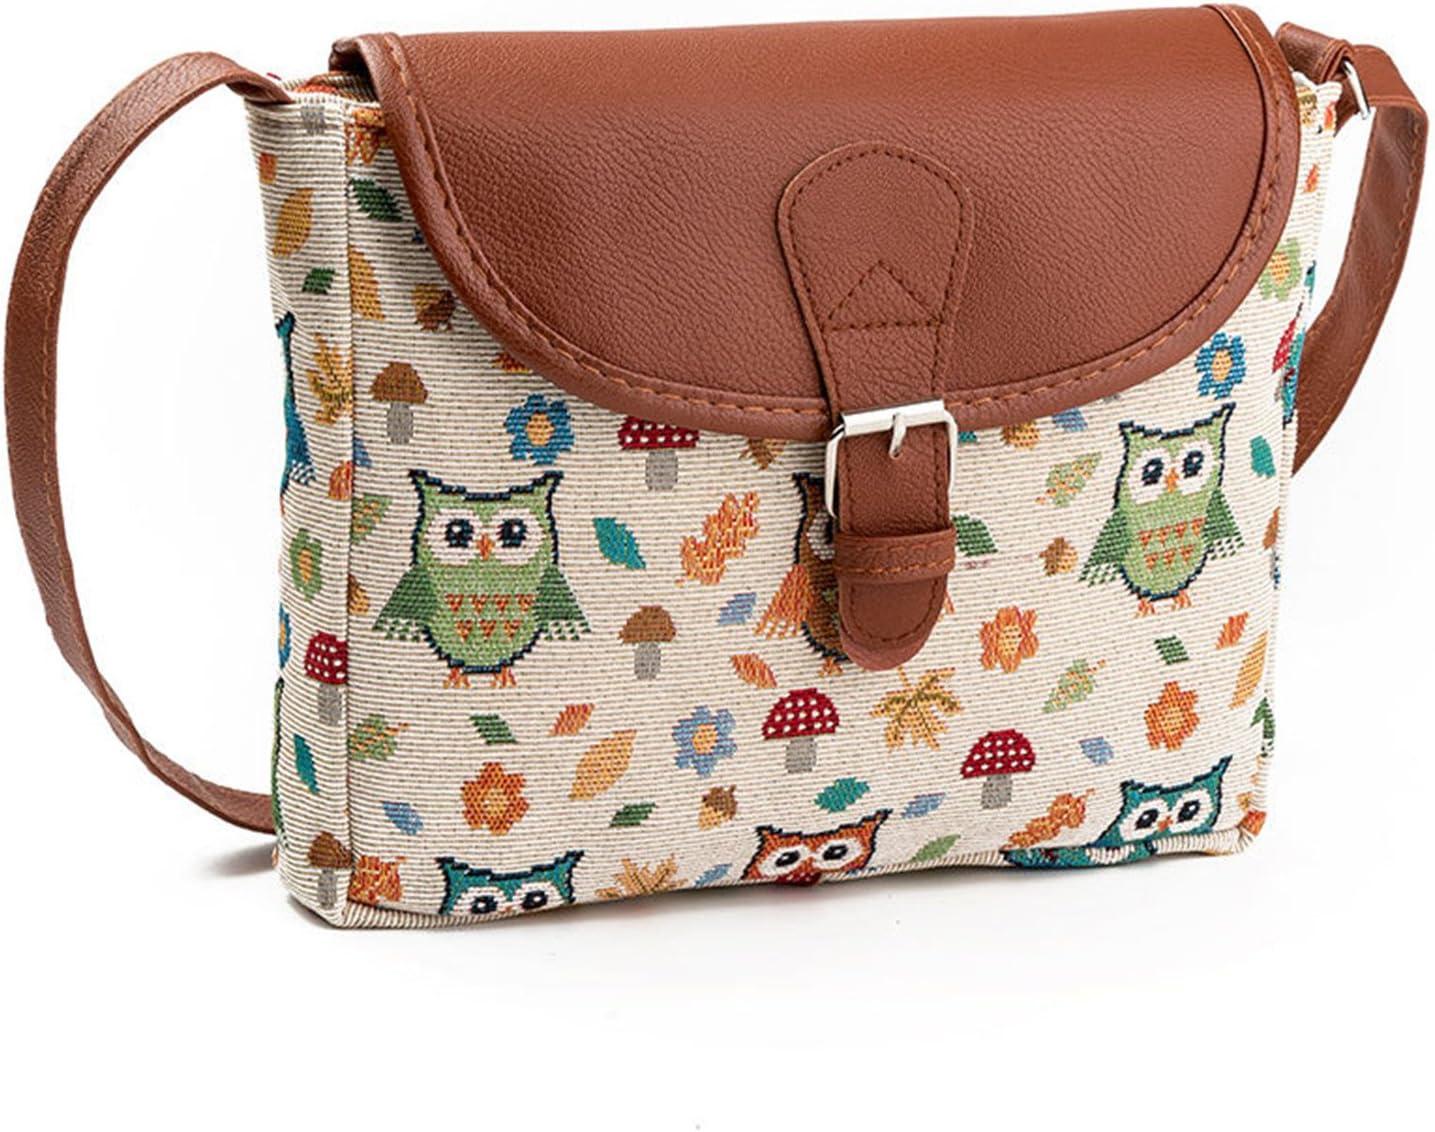 Nawoshow Fashion Women Lady Many Owl Satchel Cross-Body Bag Shoulder Bag Messenger Bag (C)